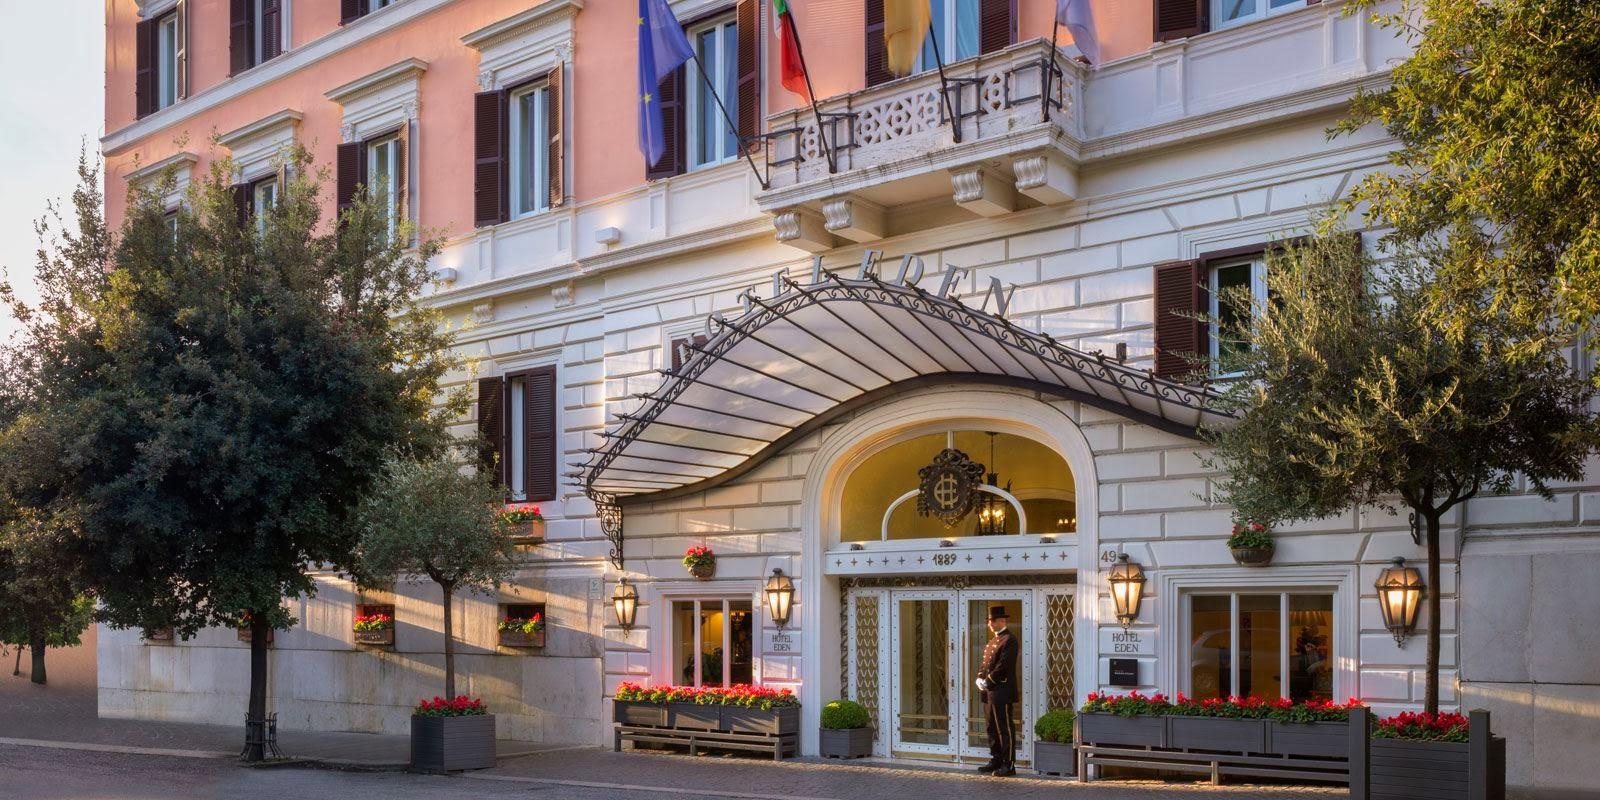 Passion for luxury luxurious hotel eden rome italy - Hotel eden en roma ...